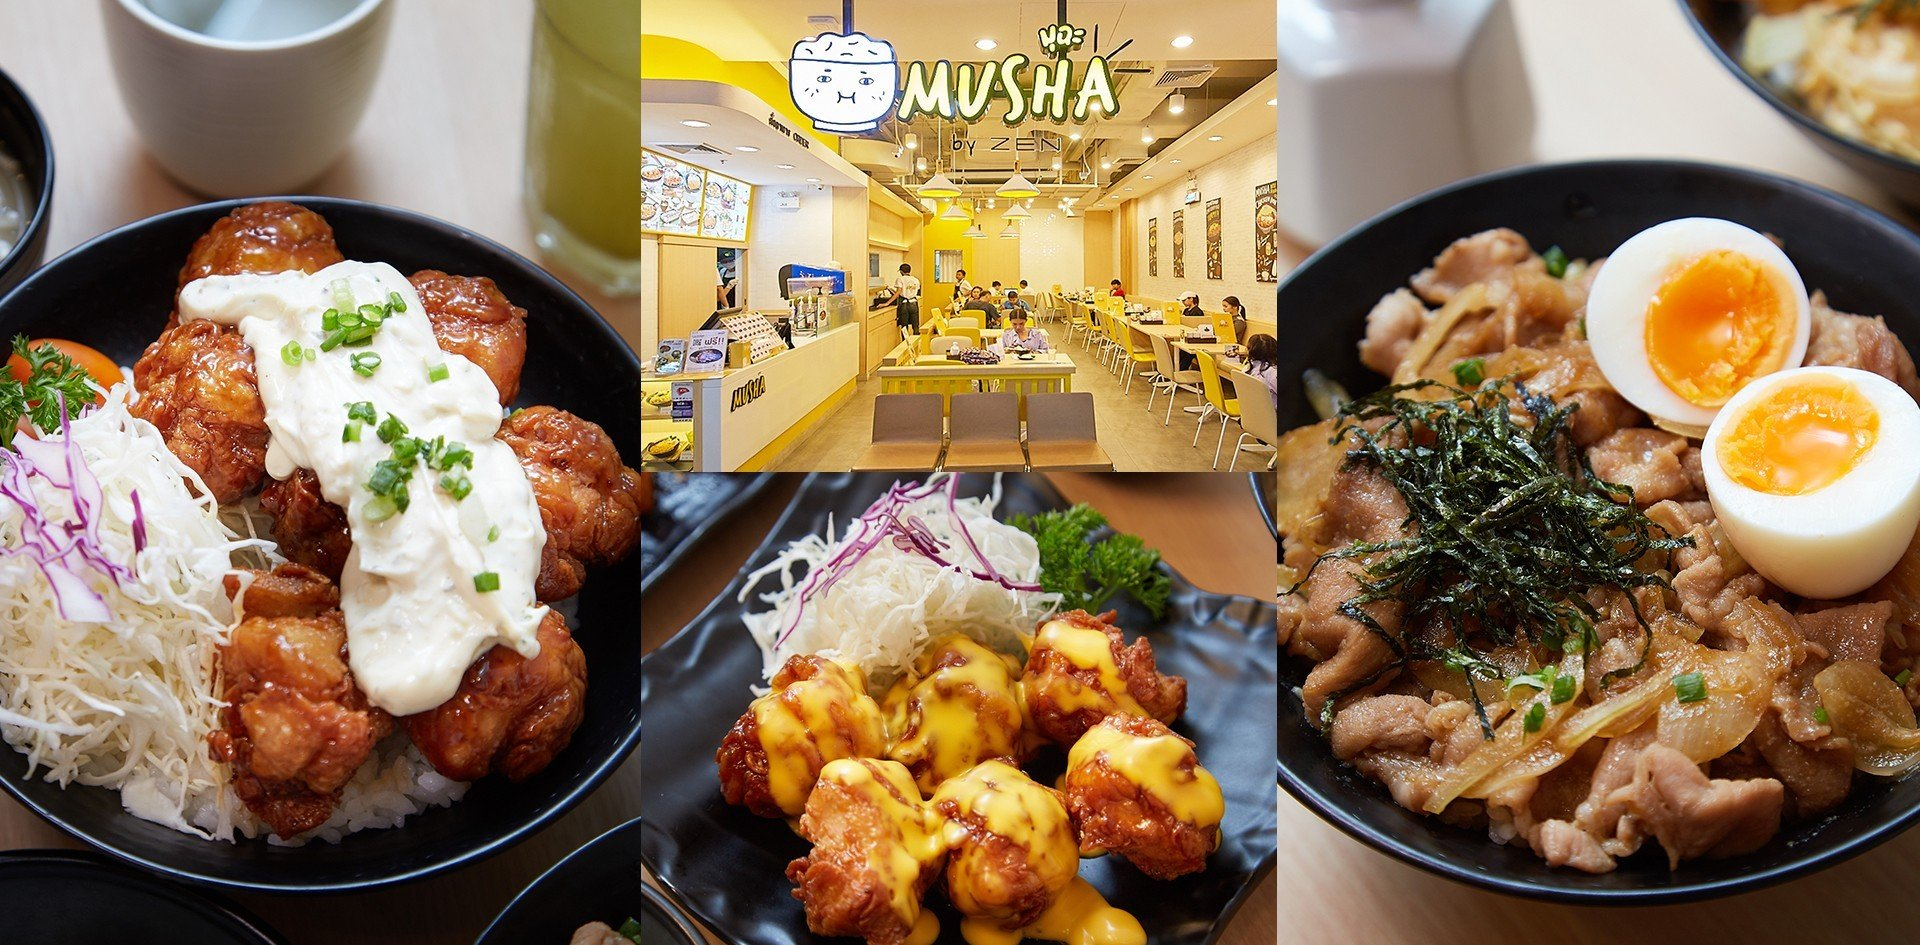 """Musha by ZEN บางแสน"" ร้านอาหารญี่ปุ่น เติมข้าวไม่อั้น อิ่มคุ้มล้นจาน!"